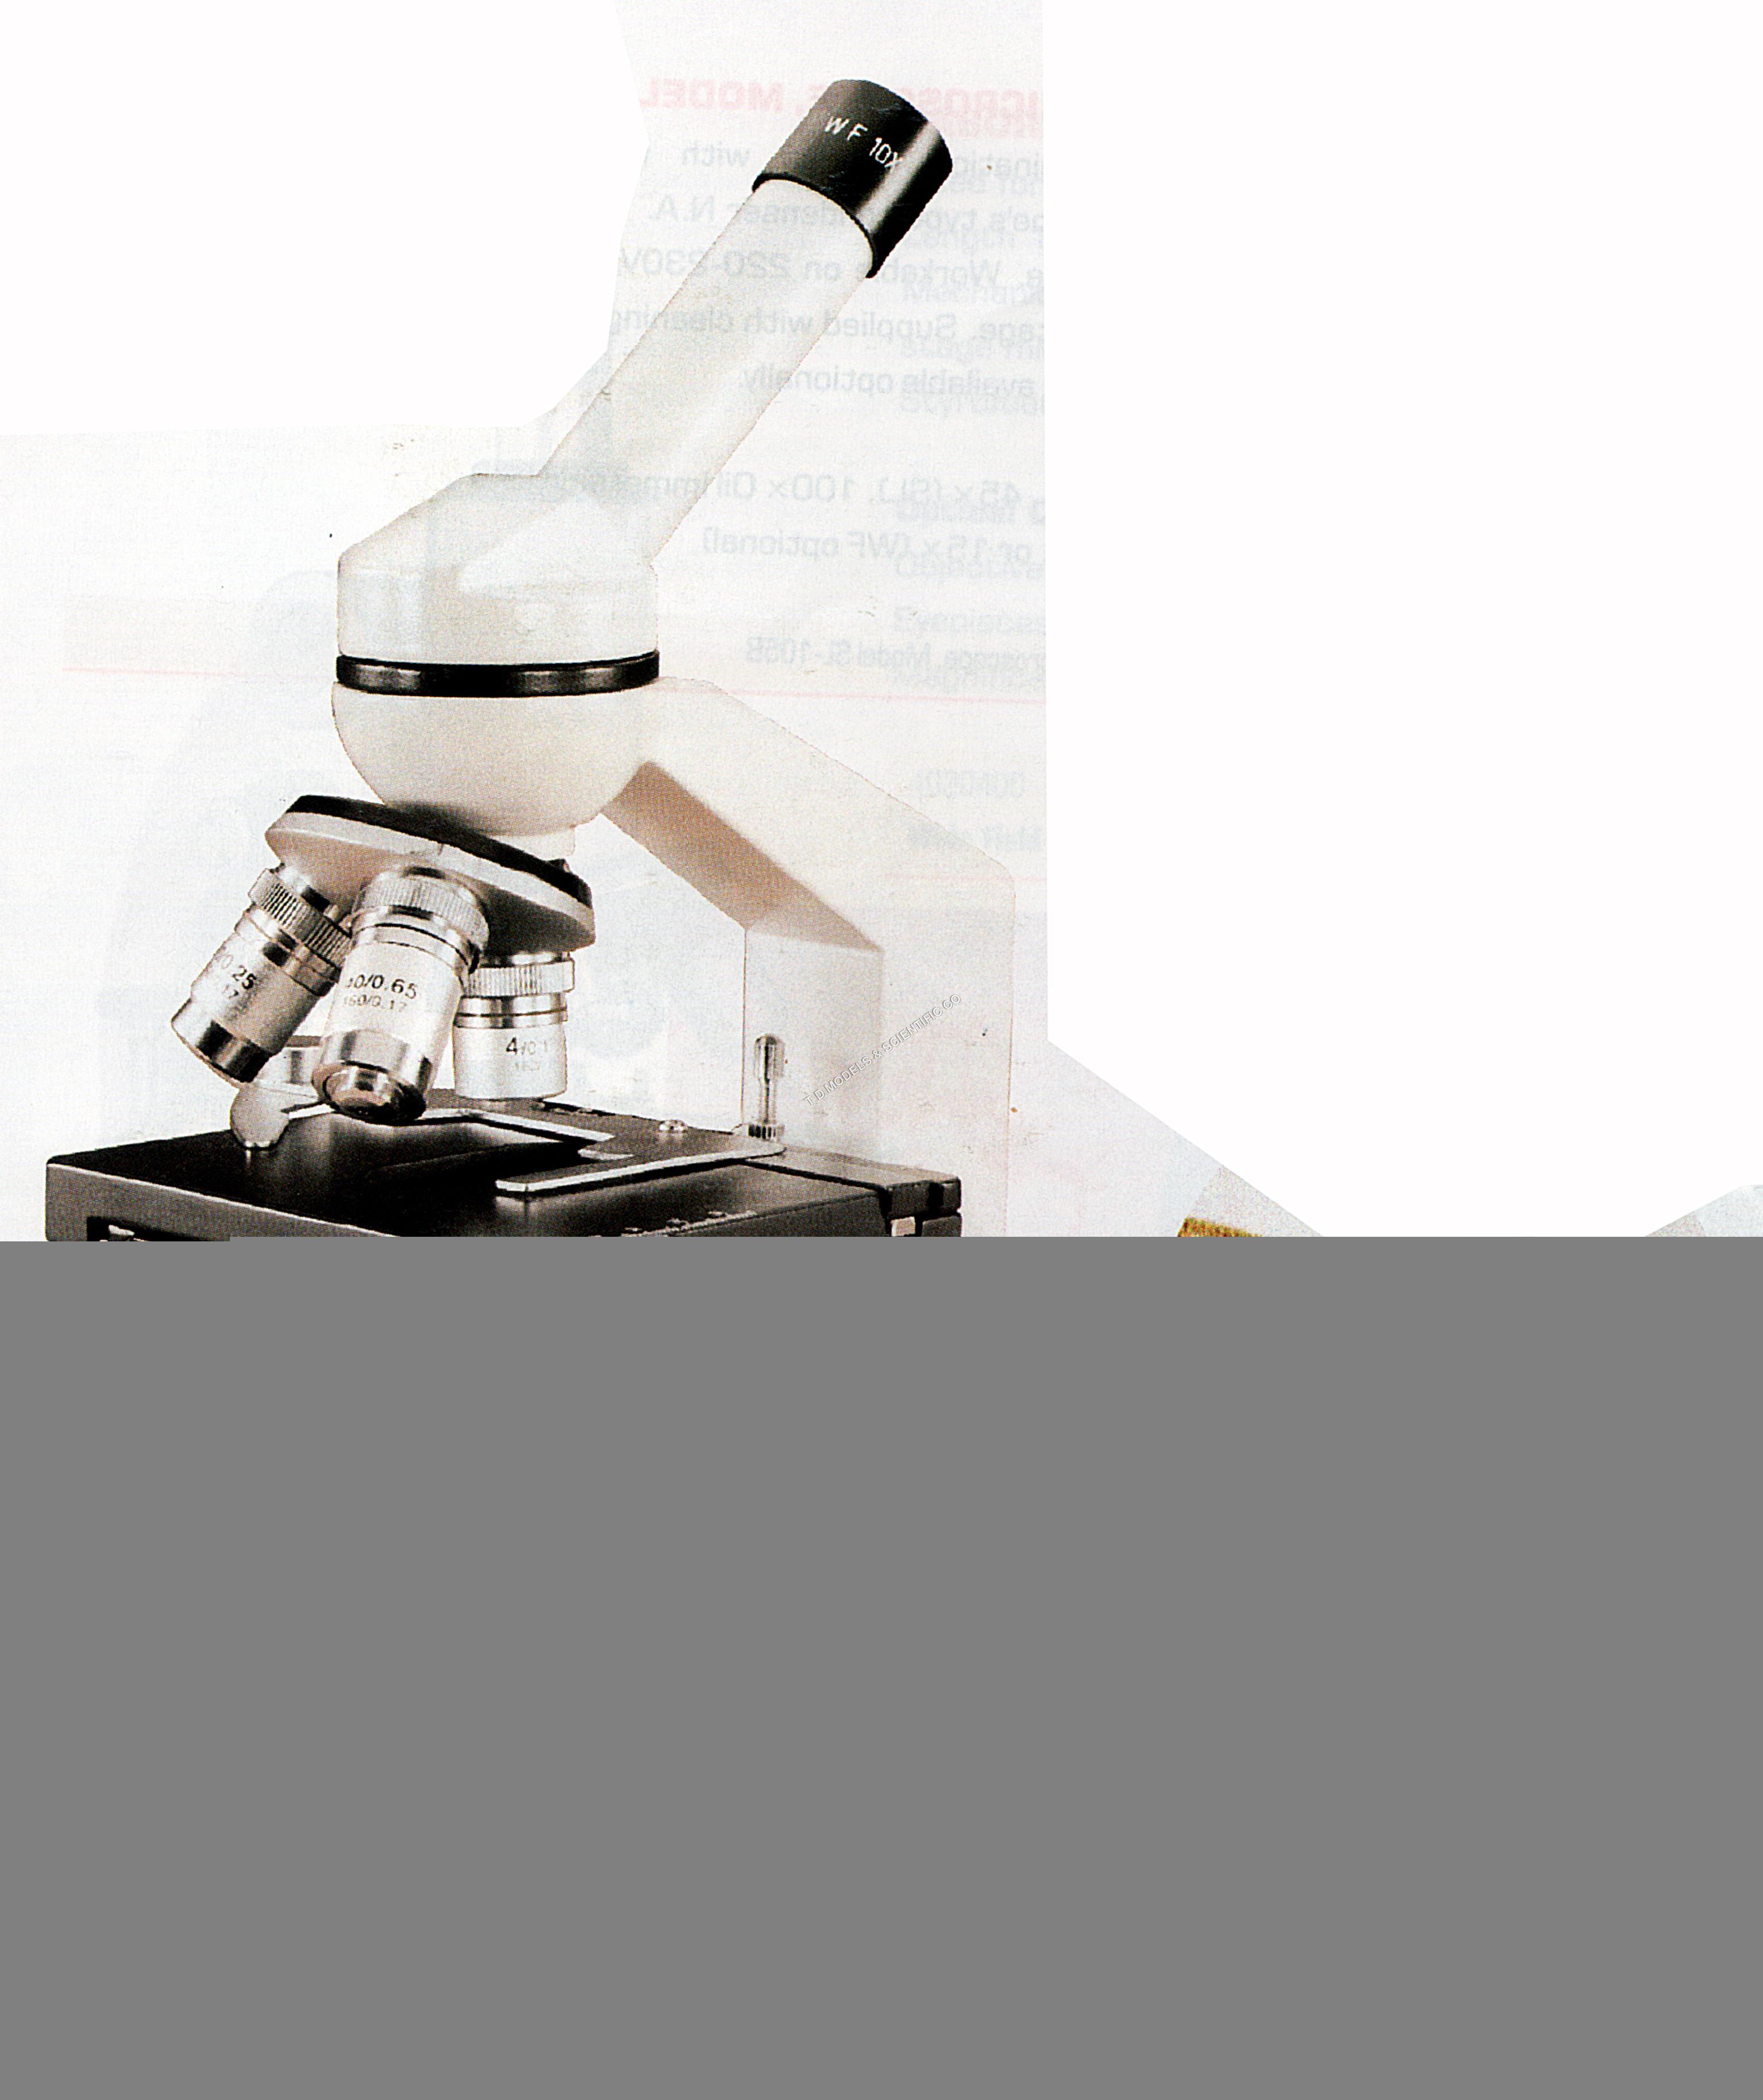 INCLINED PATHOLOGY MICROSCOPE MODEL HL 110